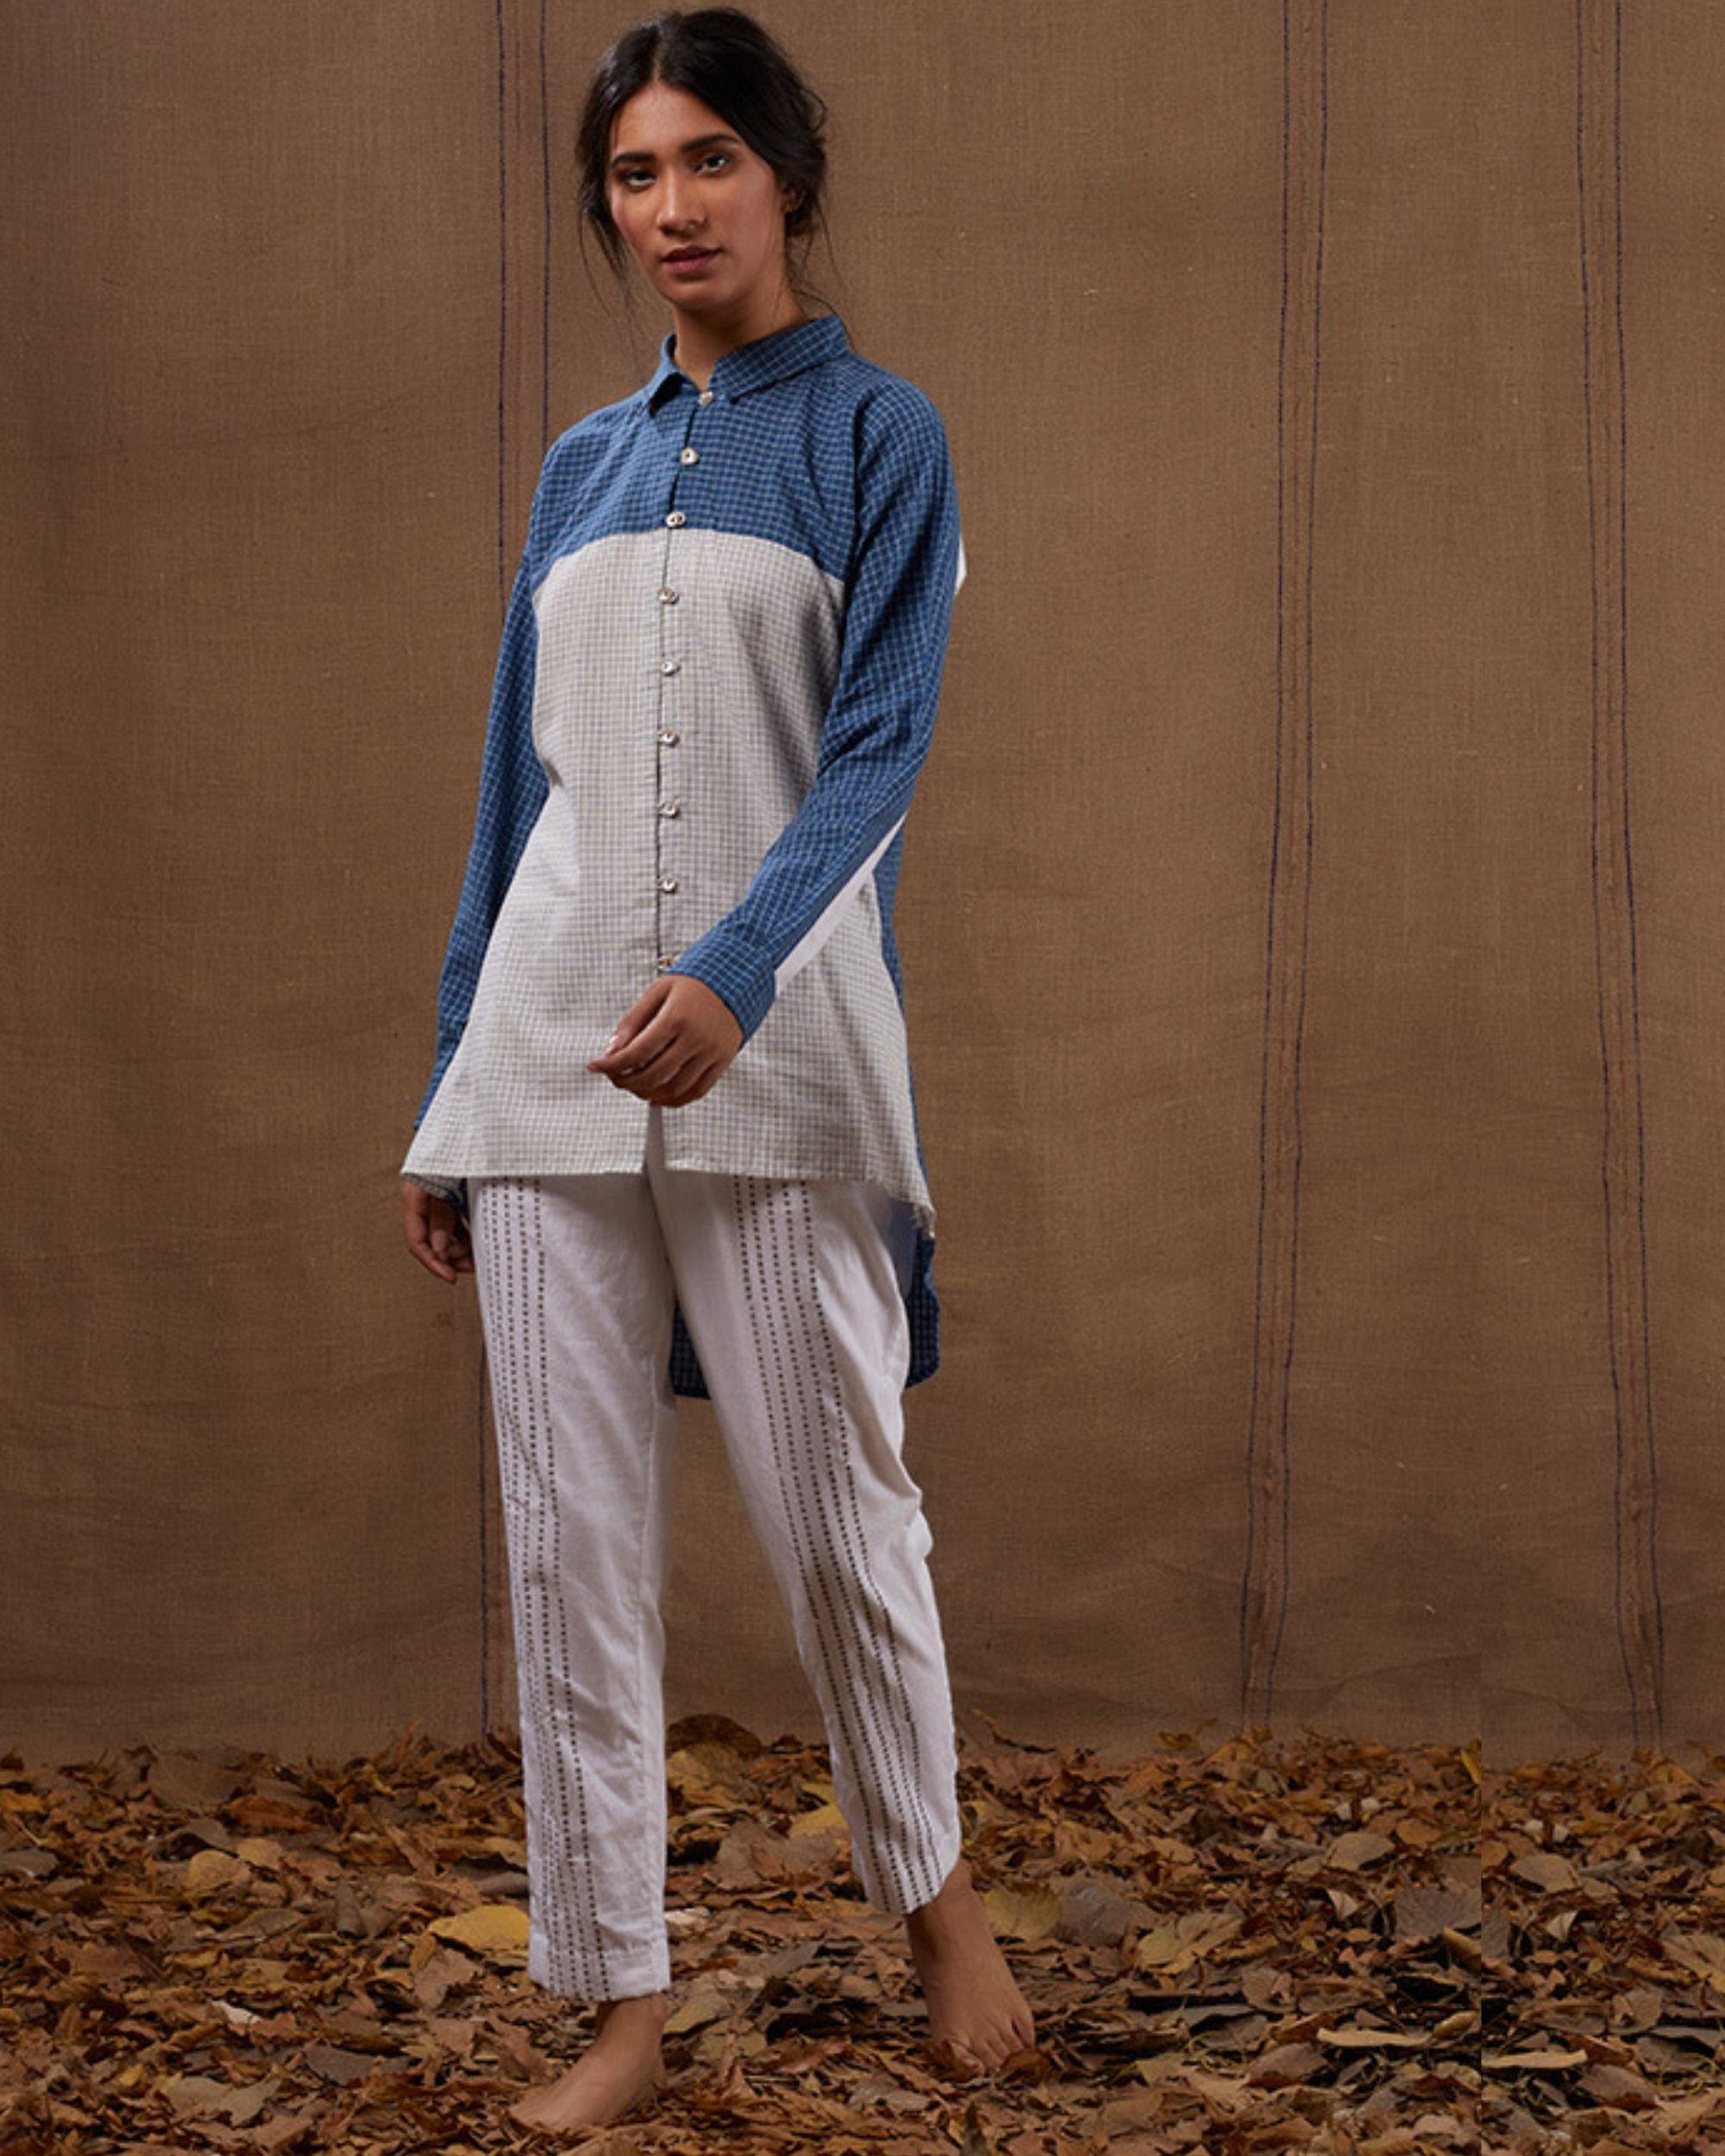 Cotton blue-white checks shirt with pants - Set of two